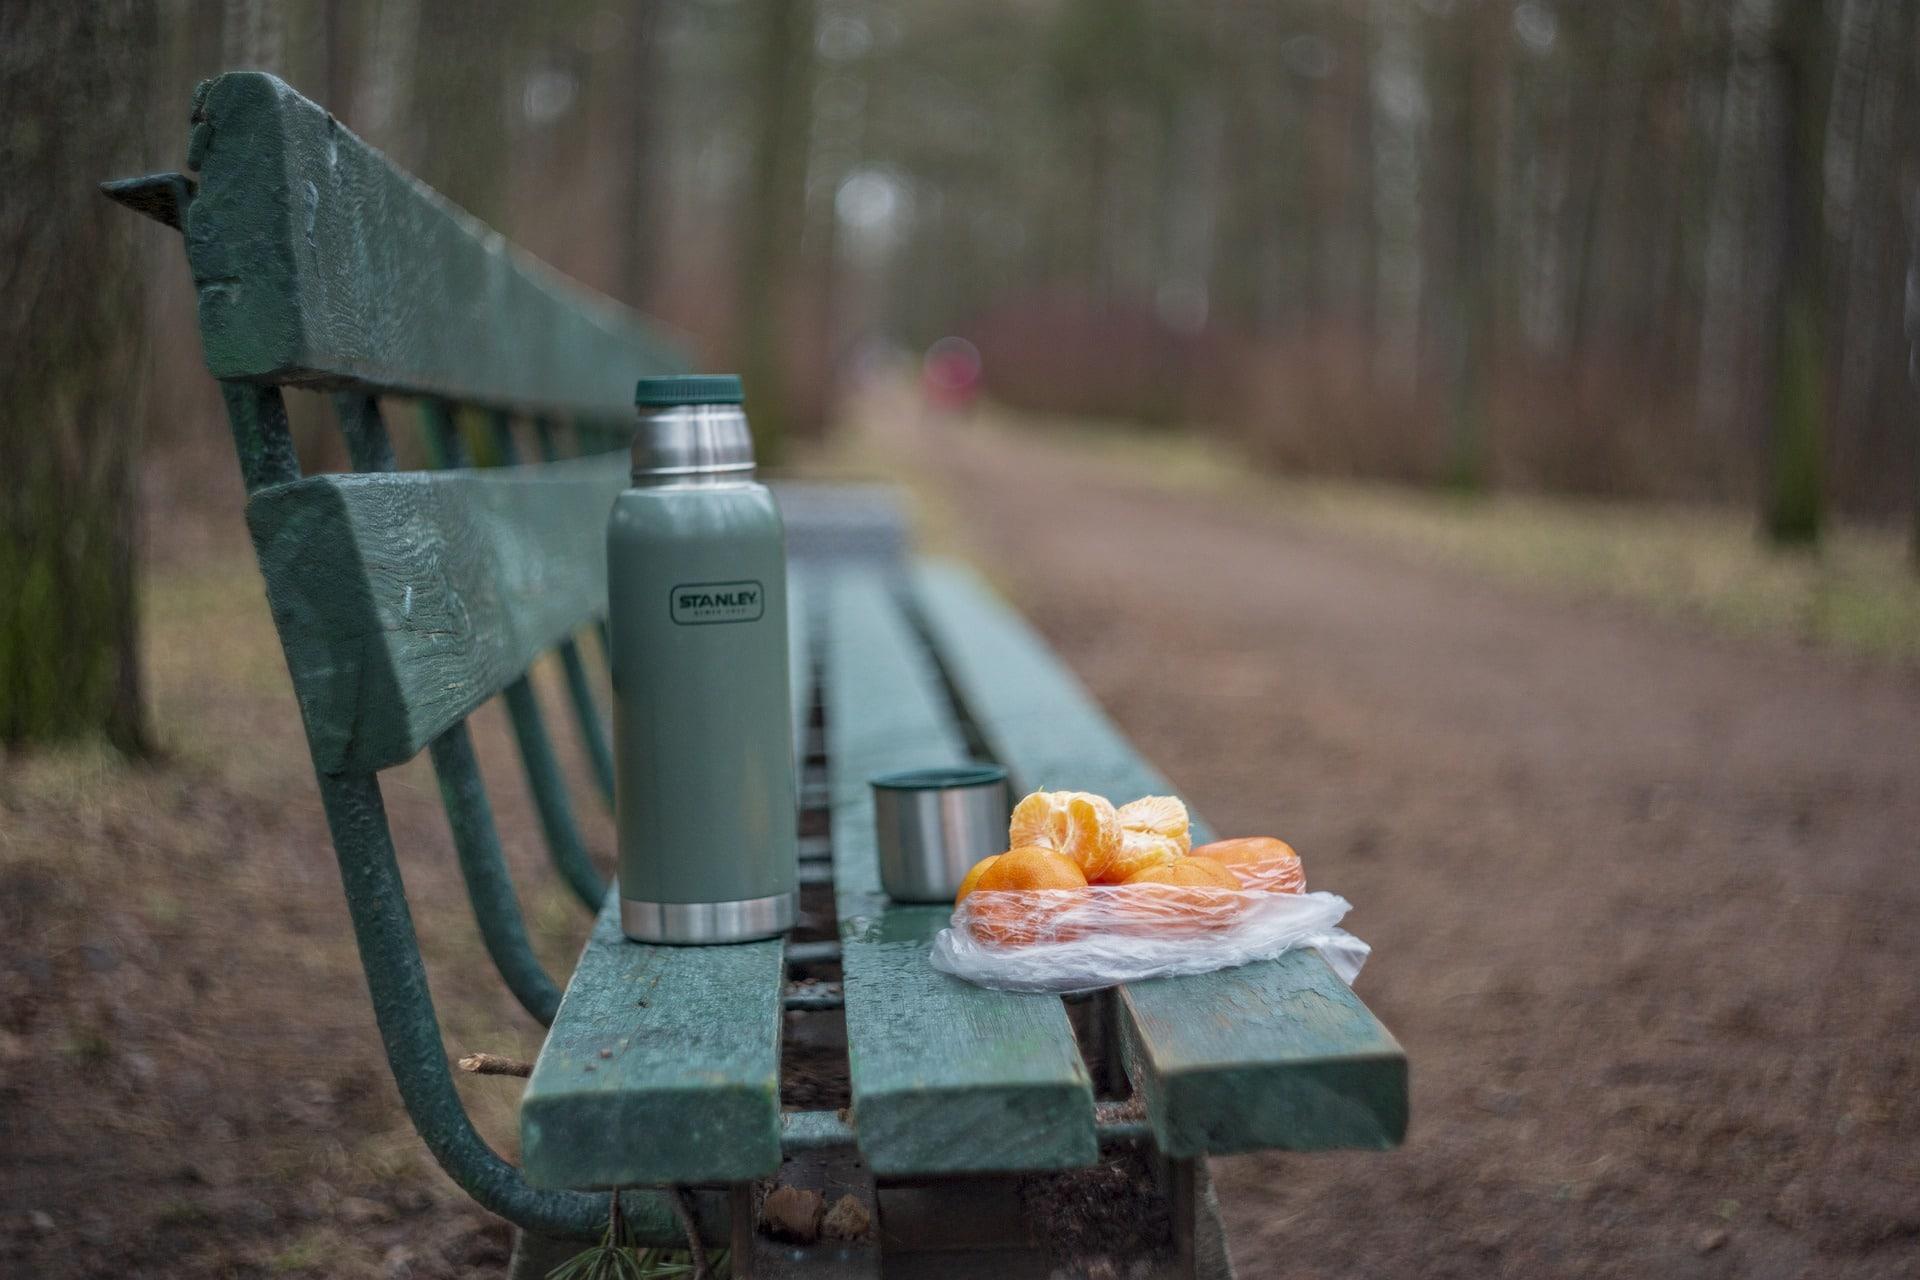 mandarin oranges thermos fruit bench pixabay